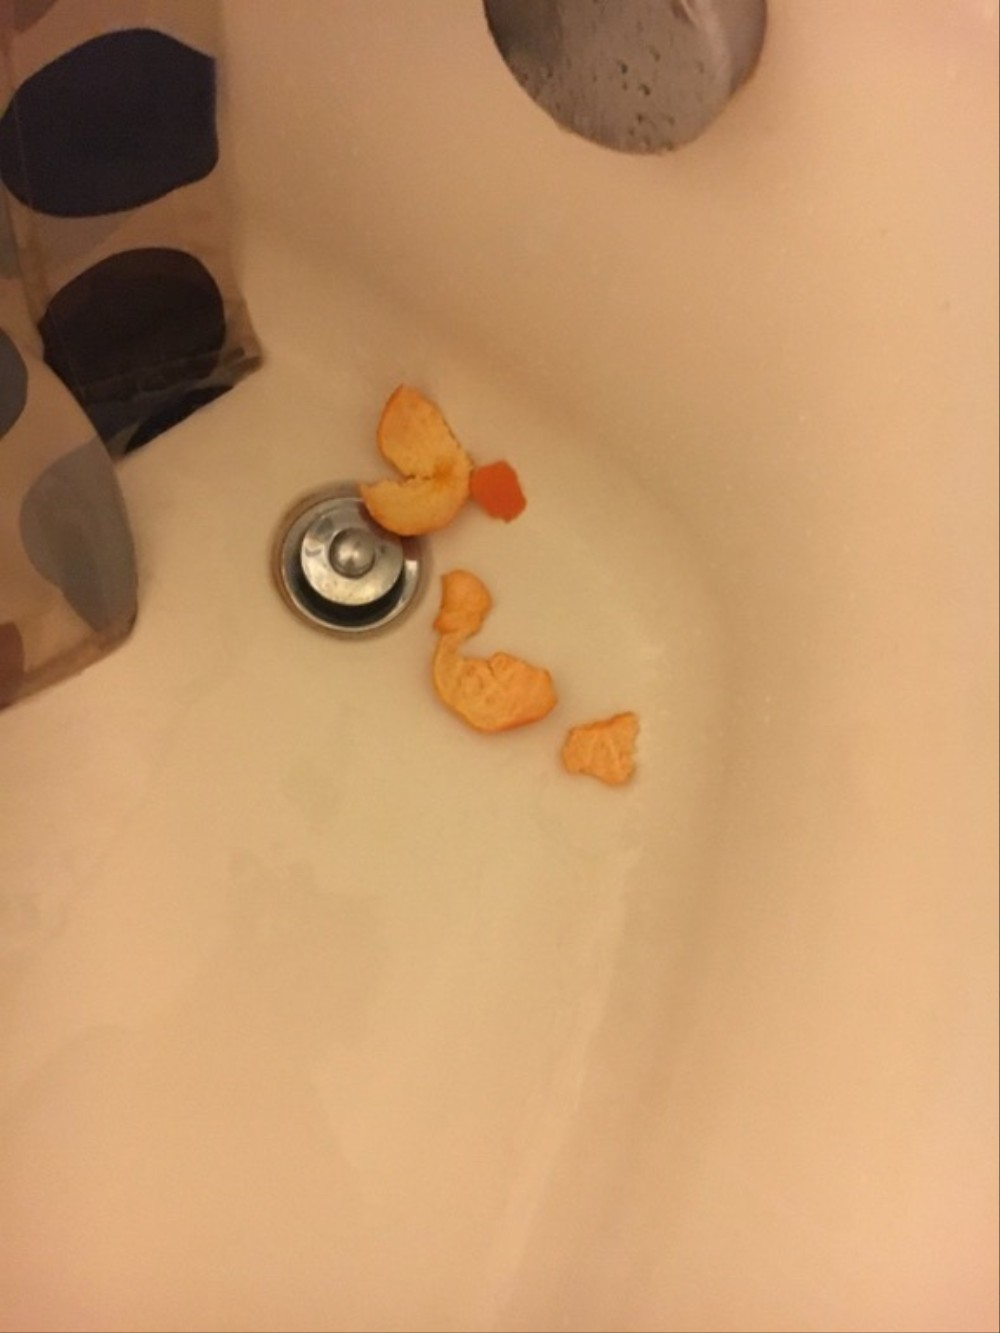 shower-orange-reddit-1